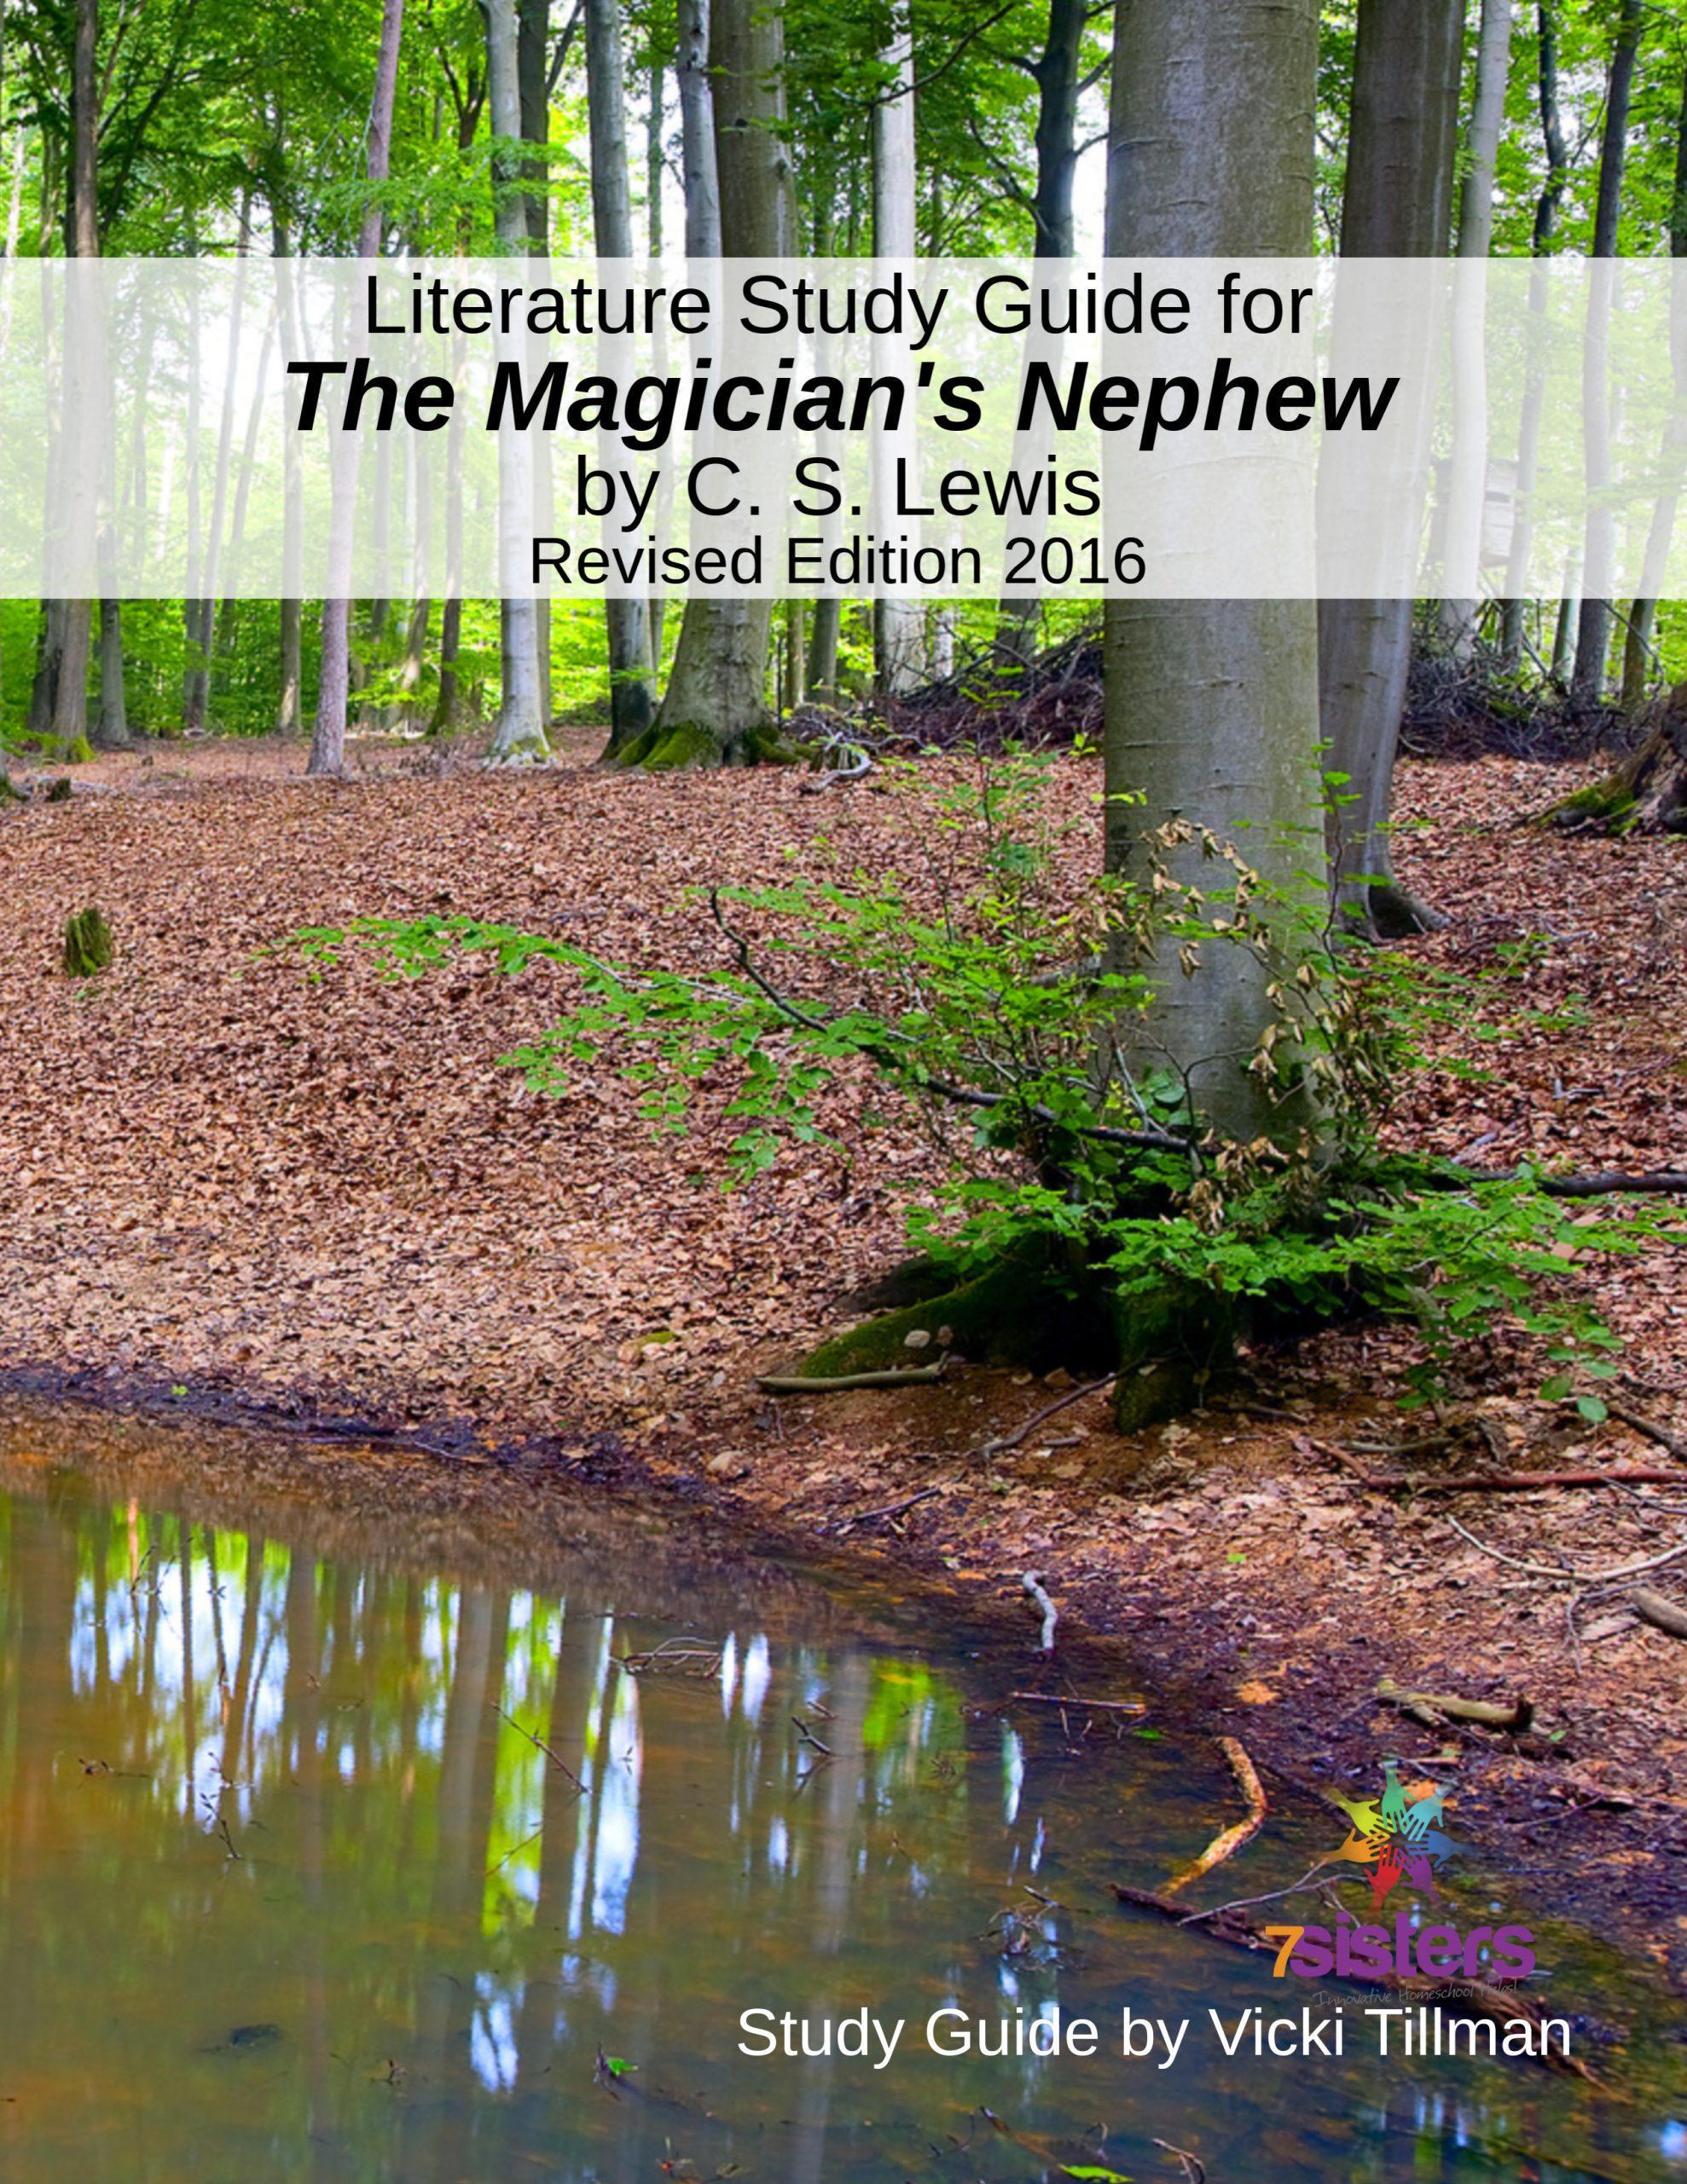 The Magician's Nephew Literature Study Guide